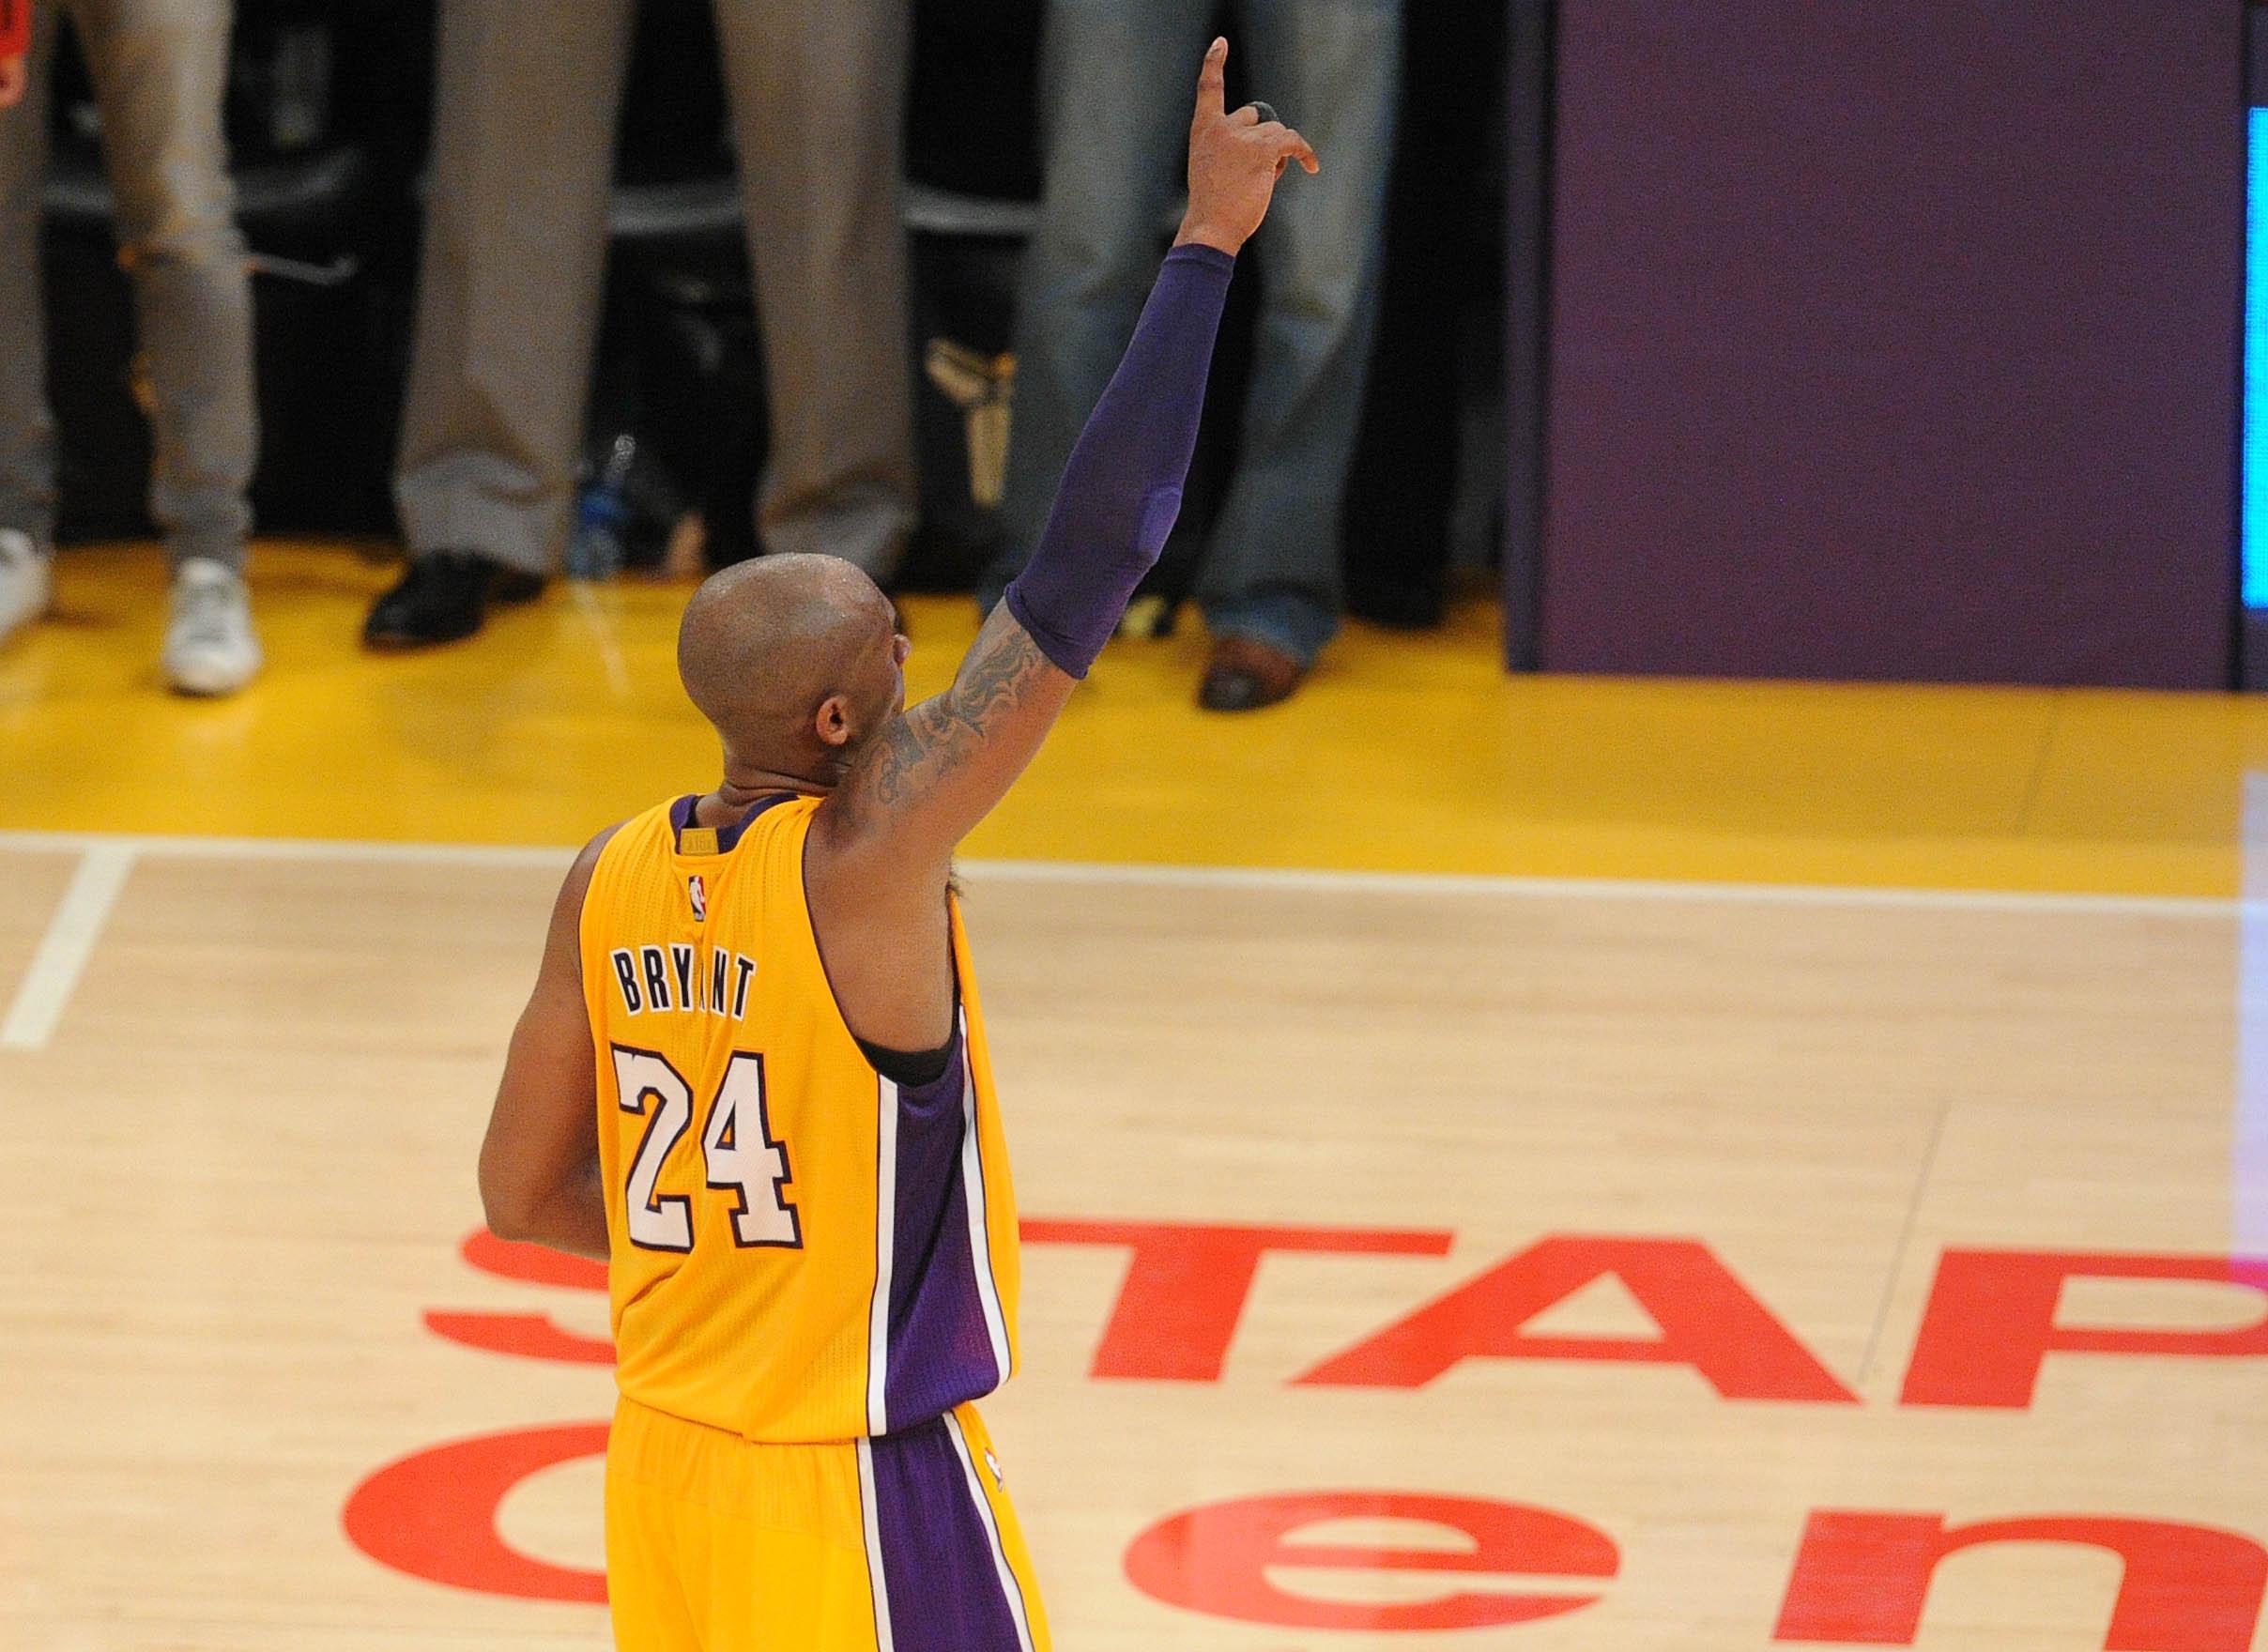 ESPN to re-air Kobe Bryant's final NBA game on Monday night